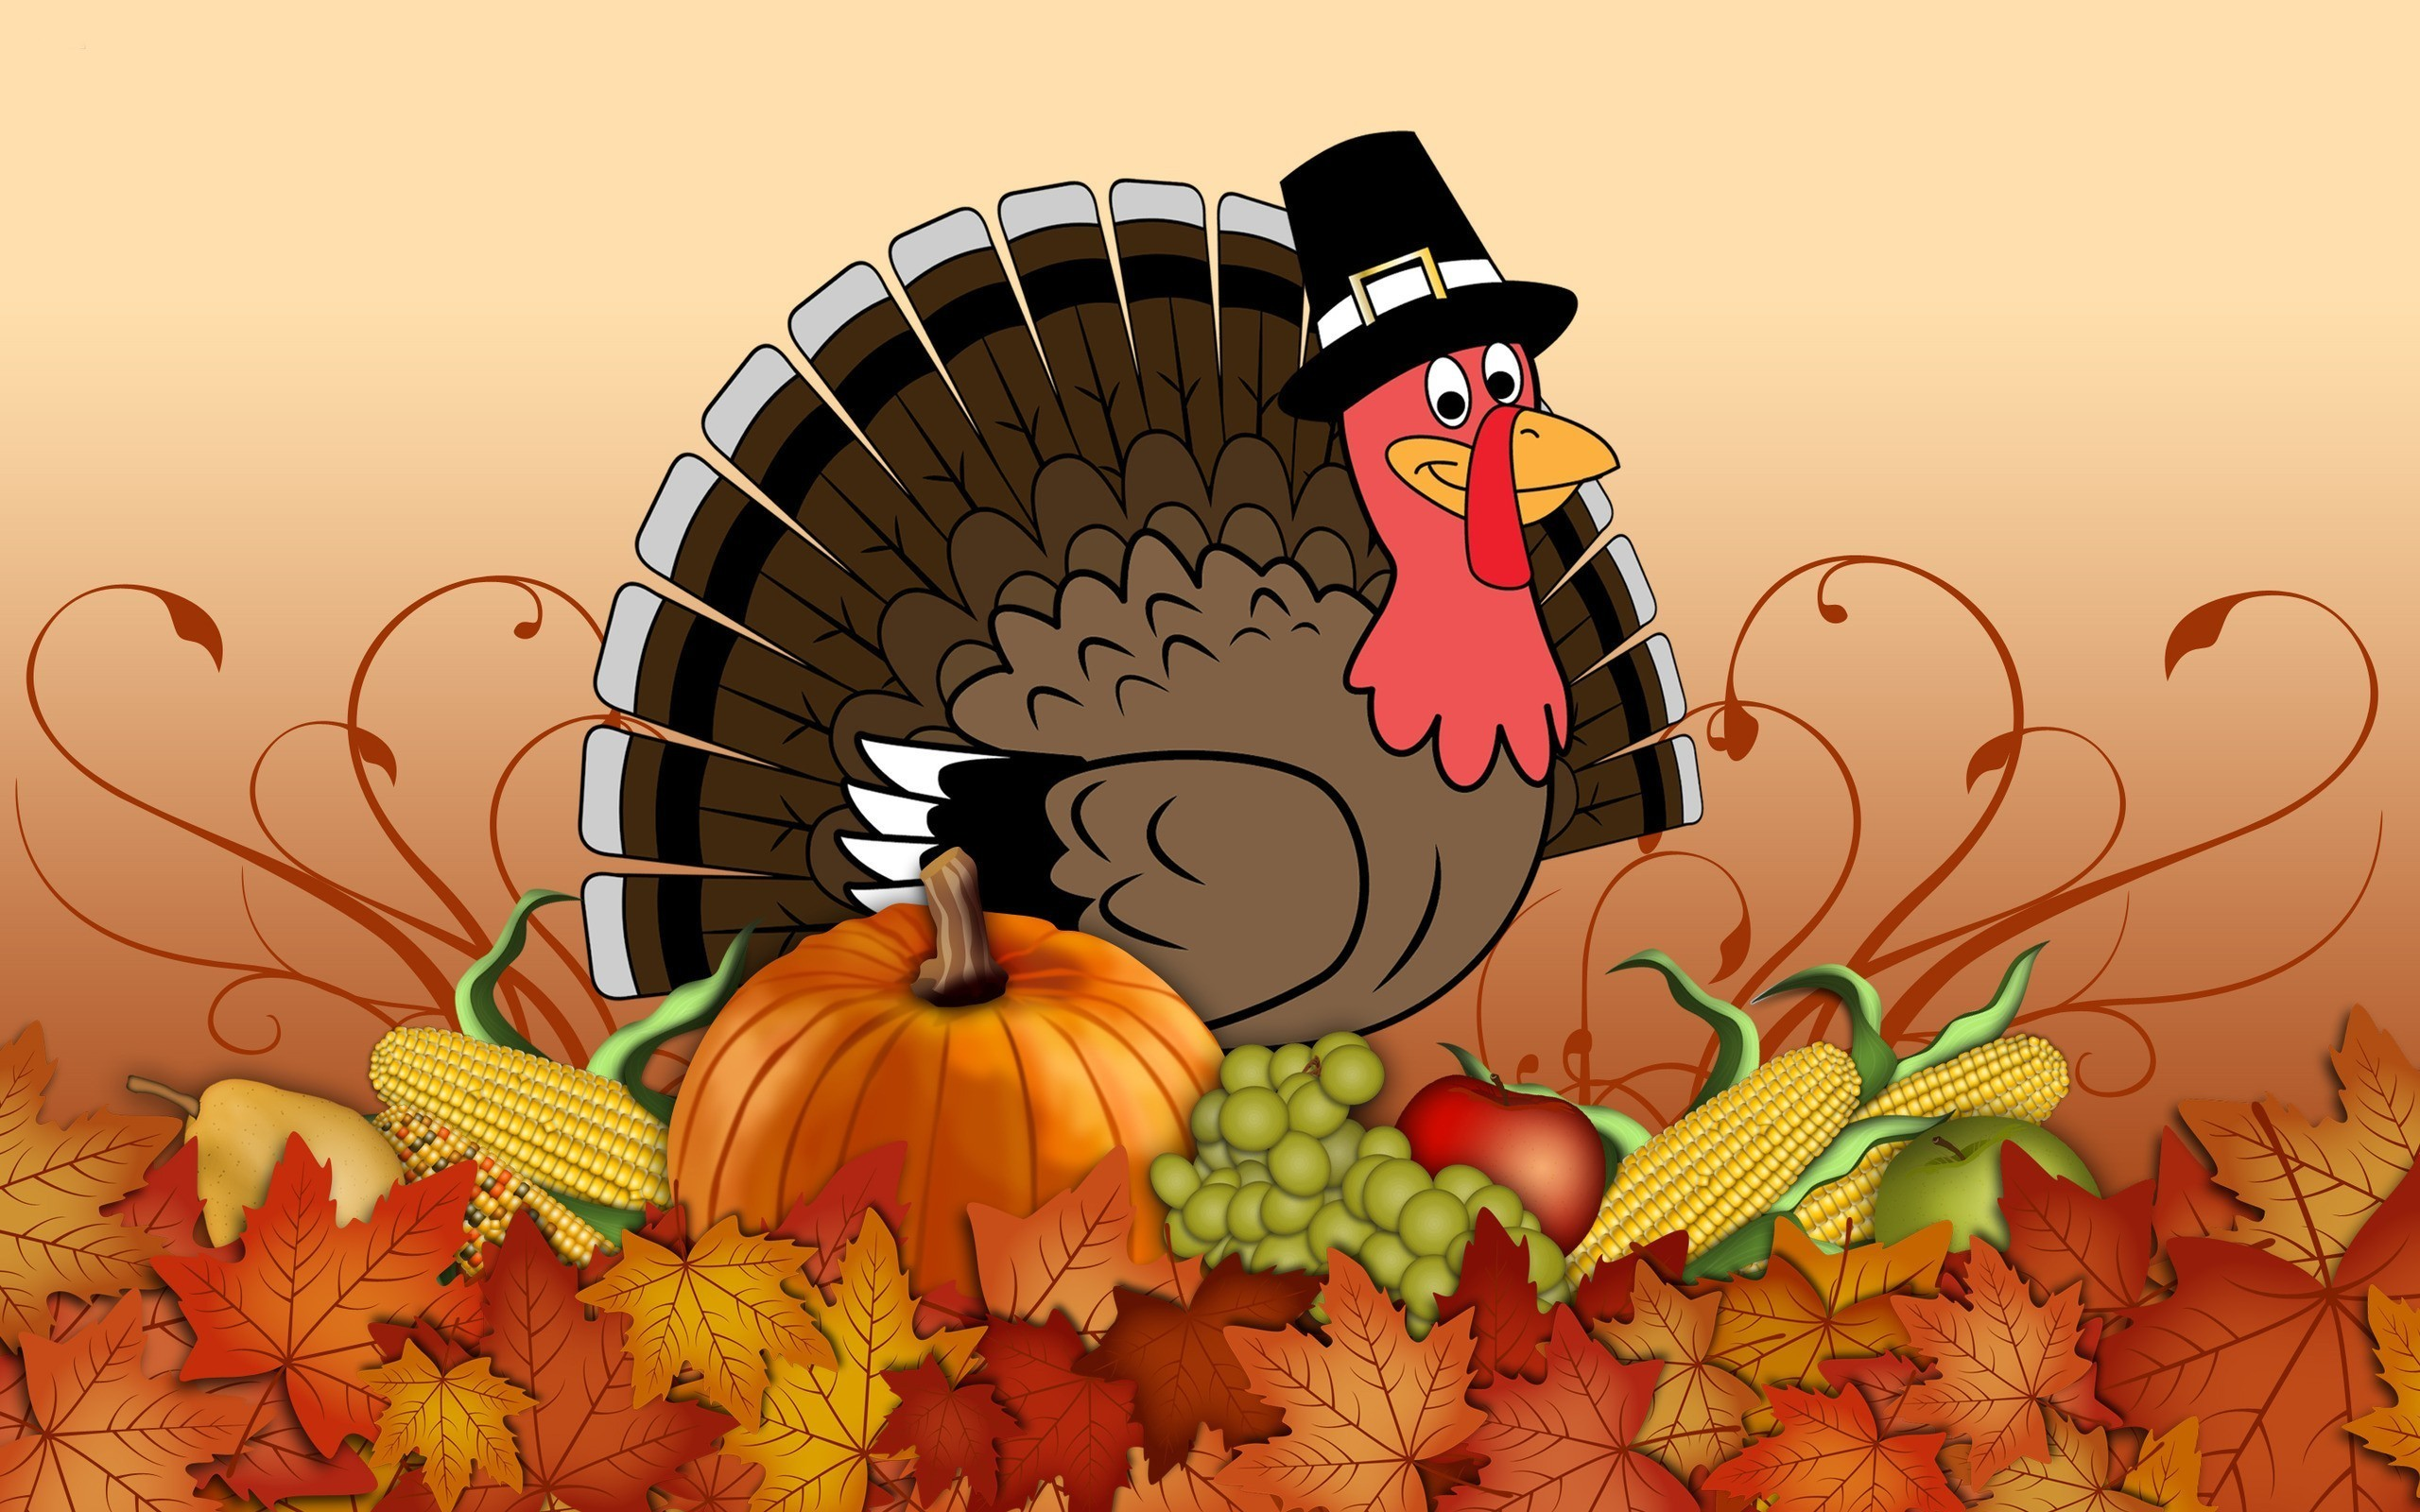 Funny Thanksgiving Wallpaper Free.